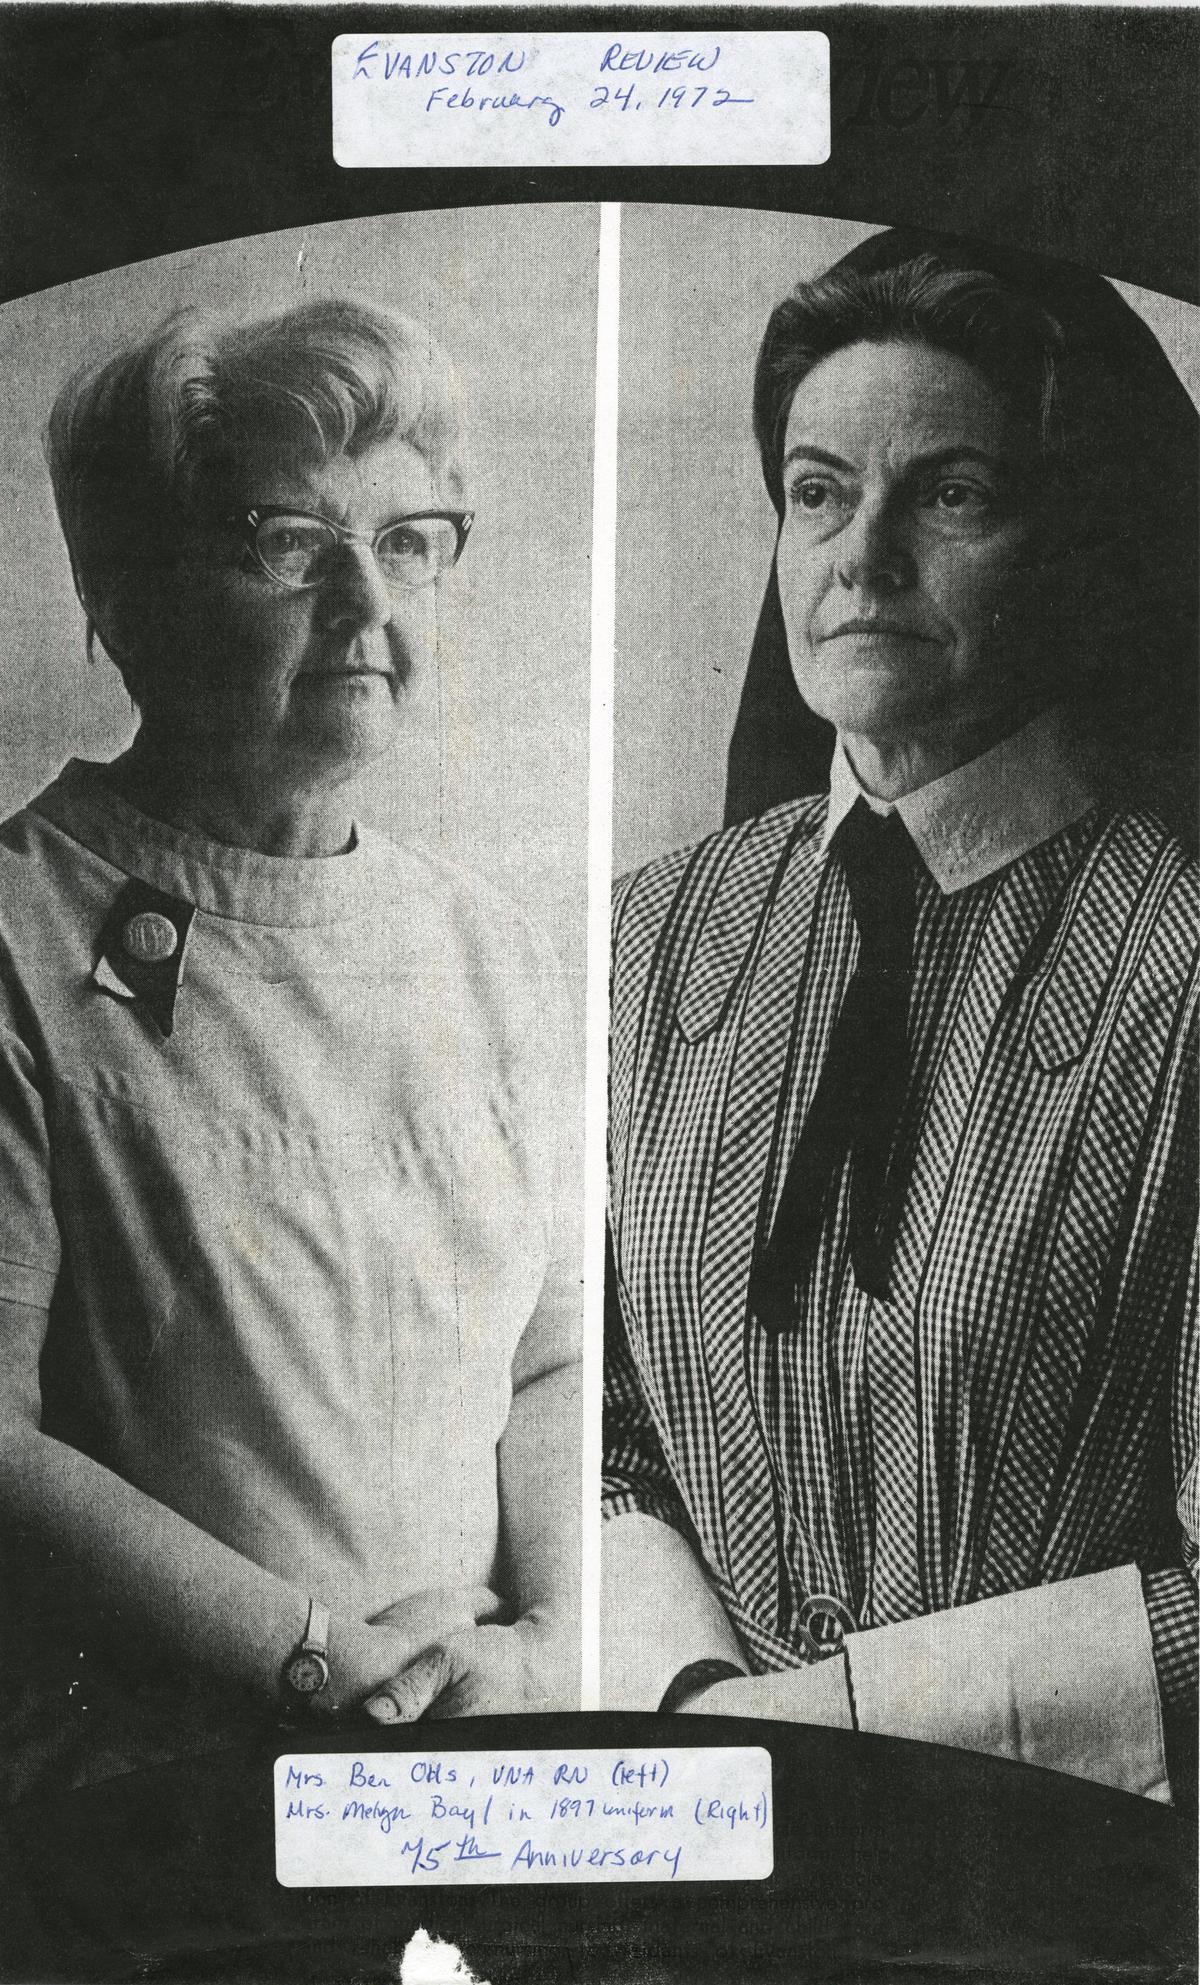 Visiting Nurse Association North: Evanston Review 1972